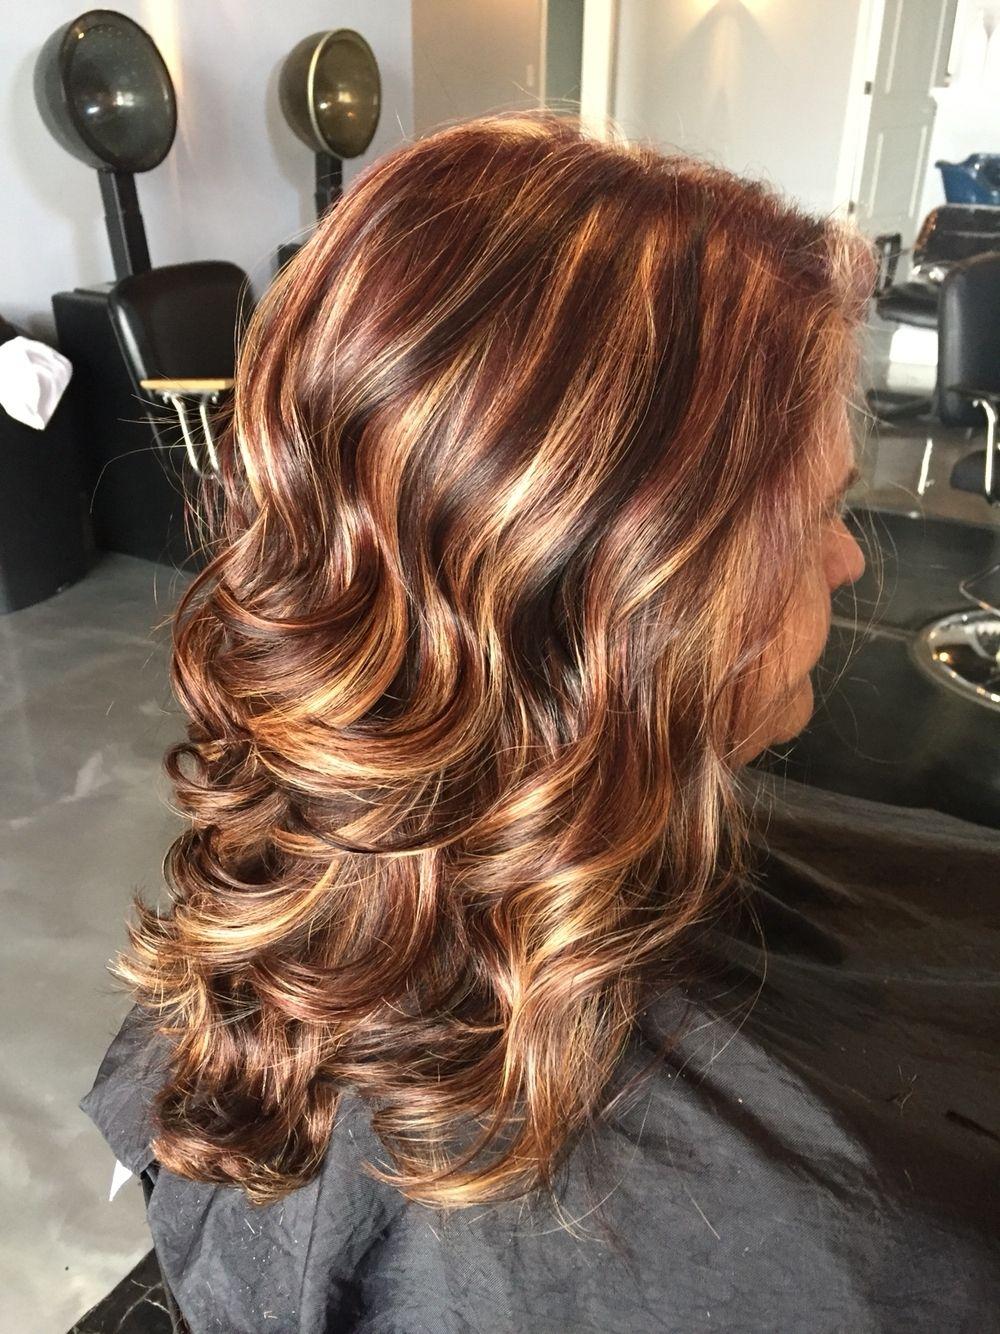 Medium Brown Hair With Dark Lowlights Makeupsite